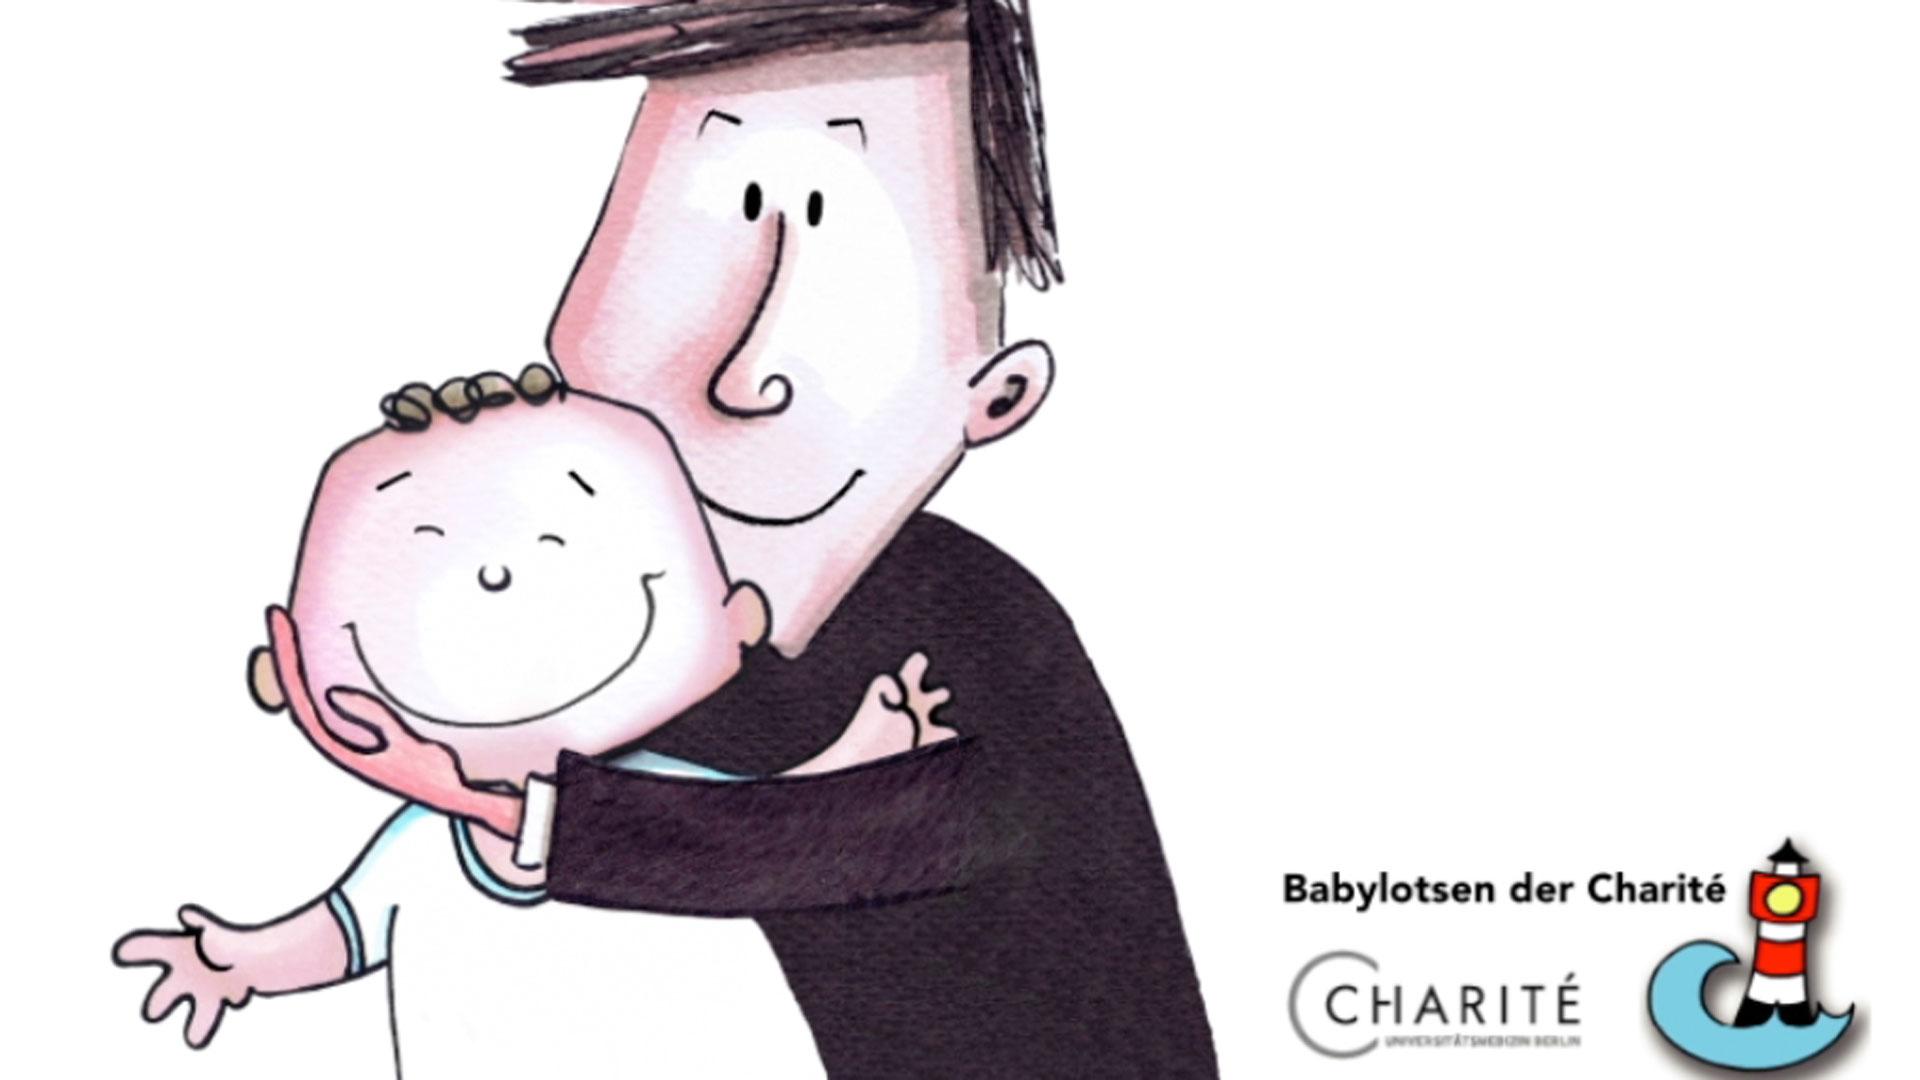 hansmann-mann-umarmt-baby-charite